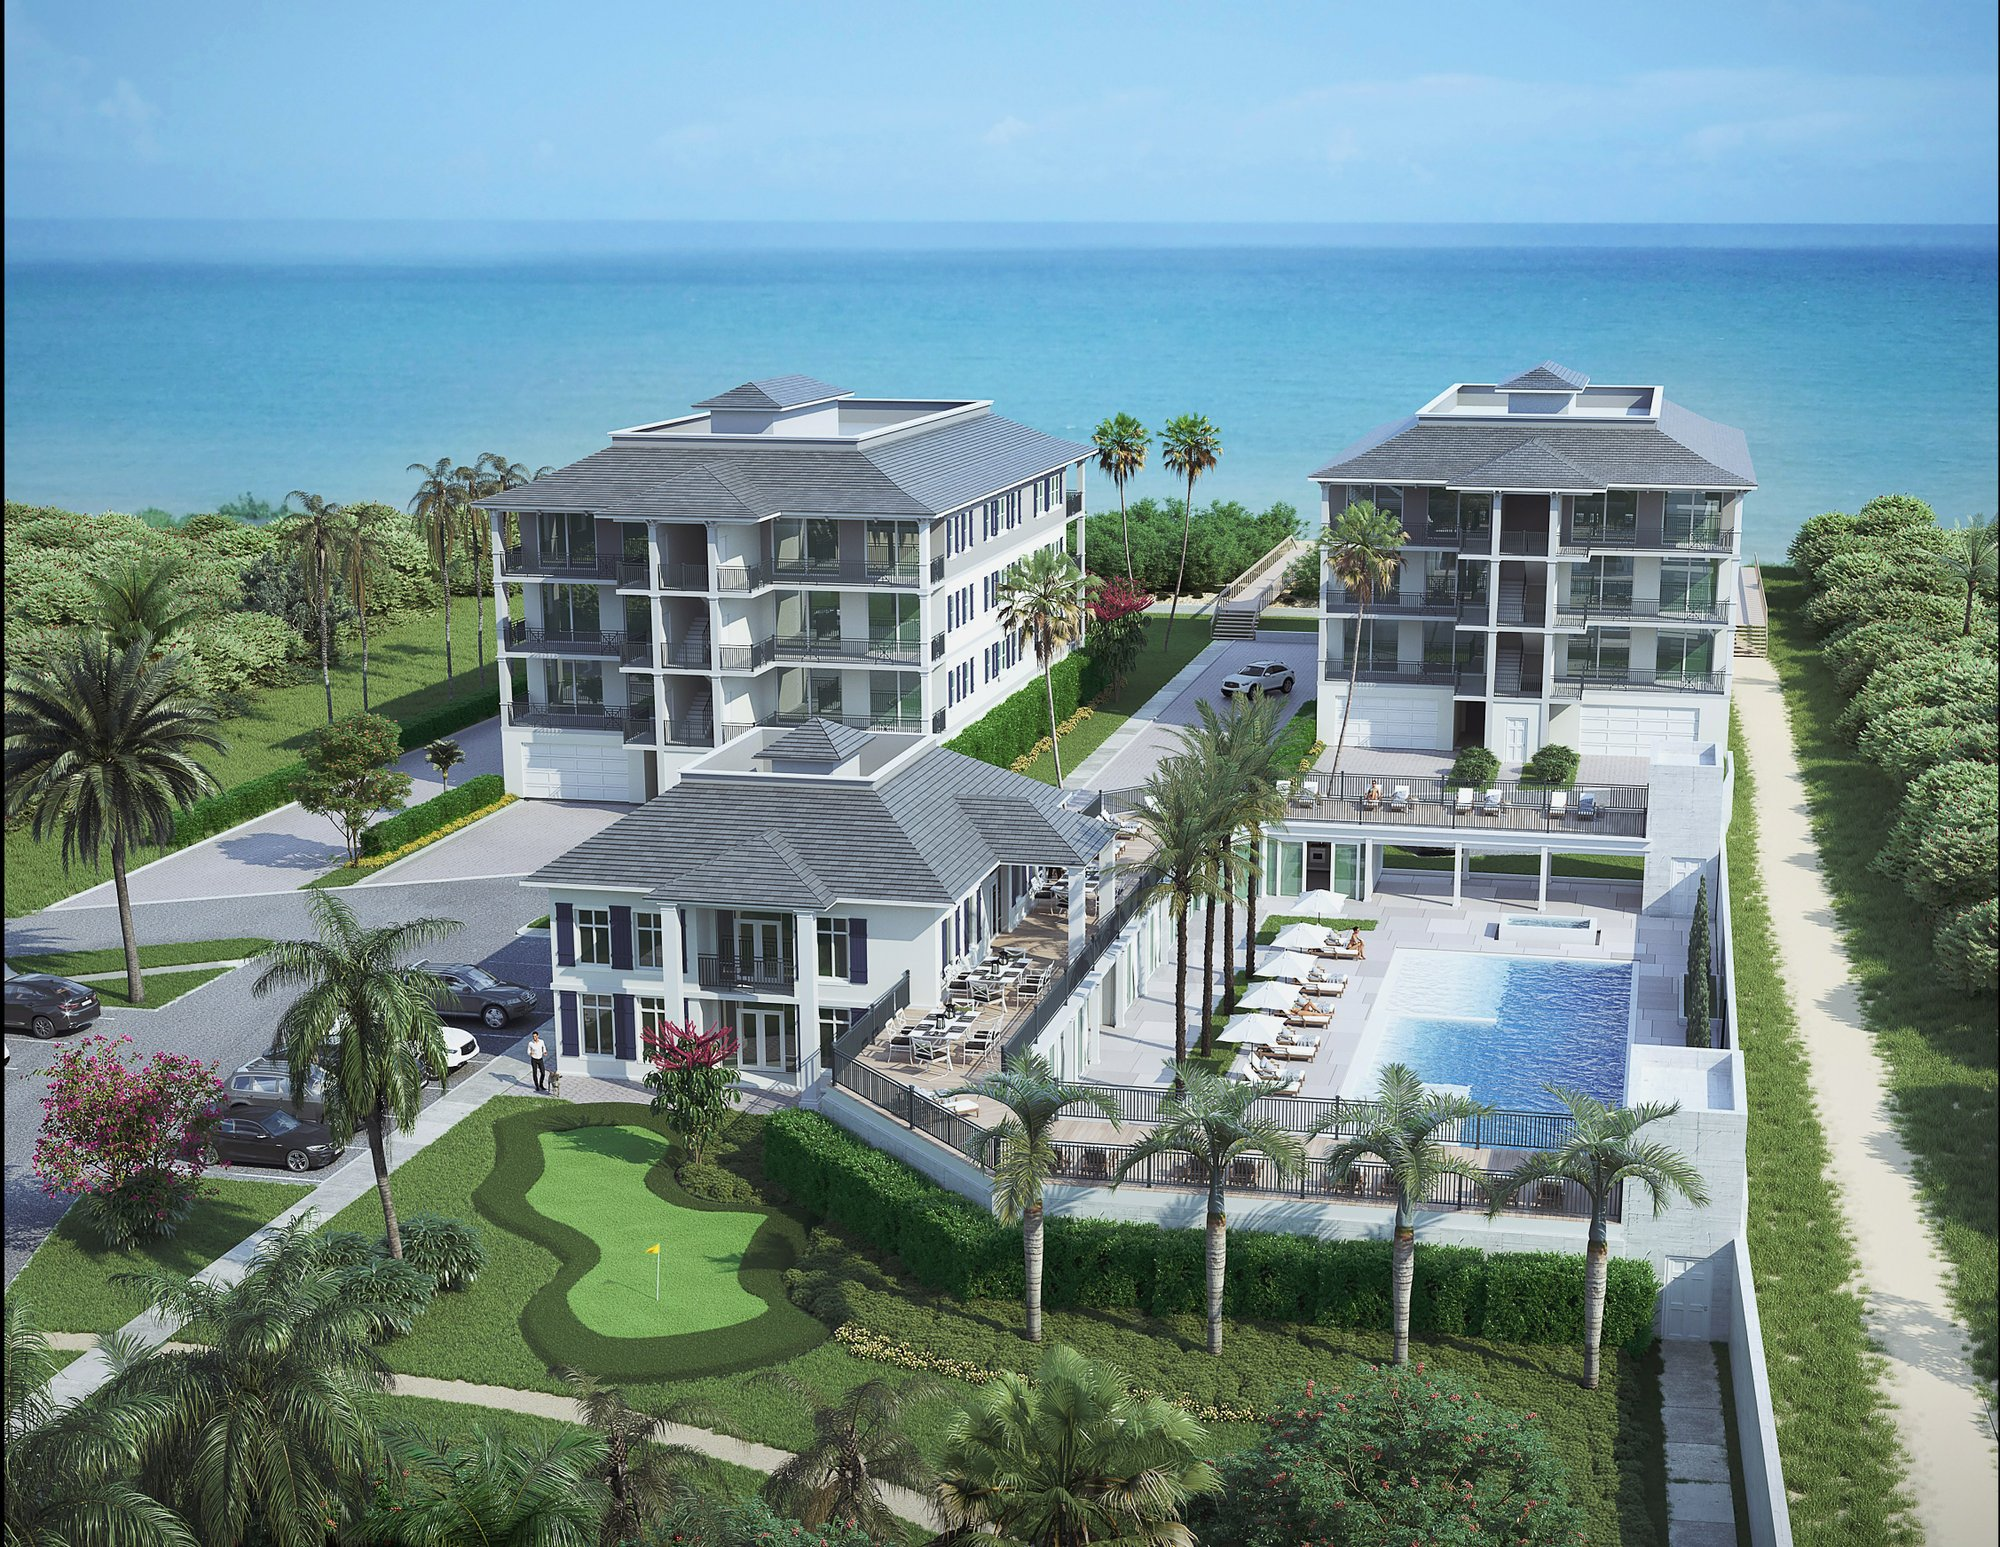 Vero Beach, Florida, United States 1 - 11420152